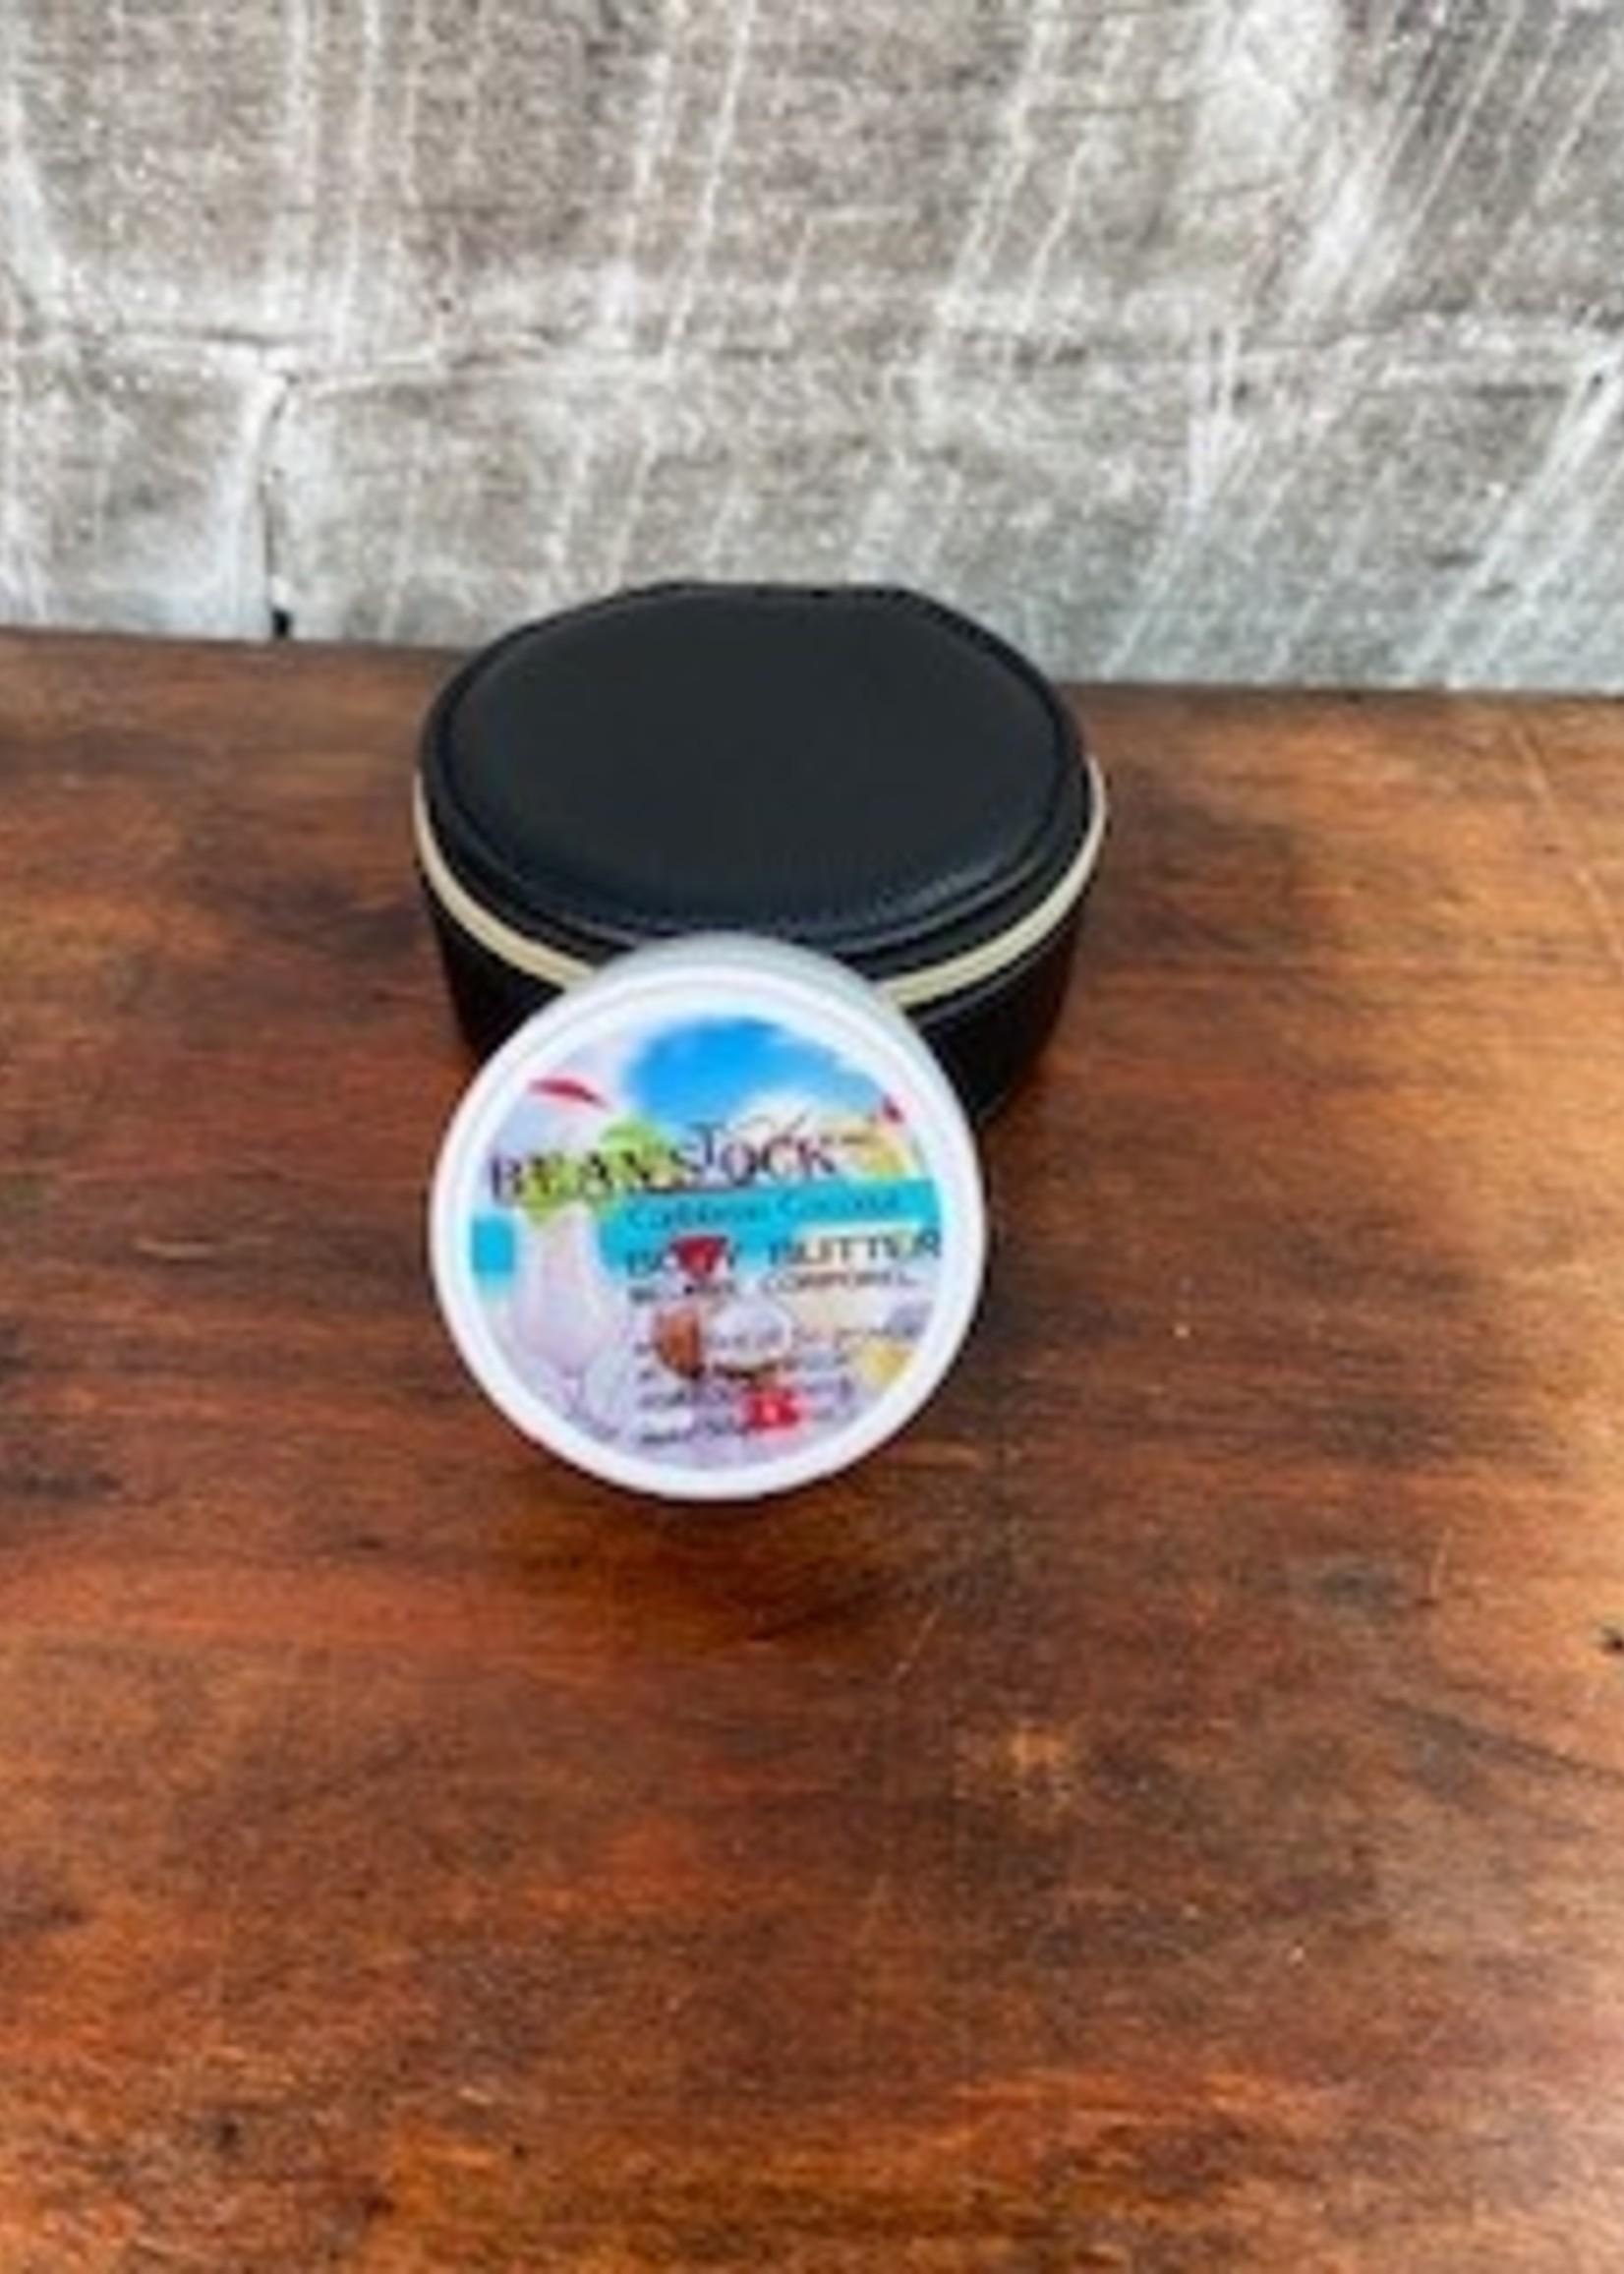 Bean stock Body Butter Travel Size Caribbean Coconut 56g